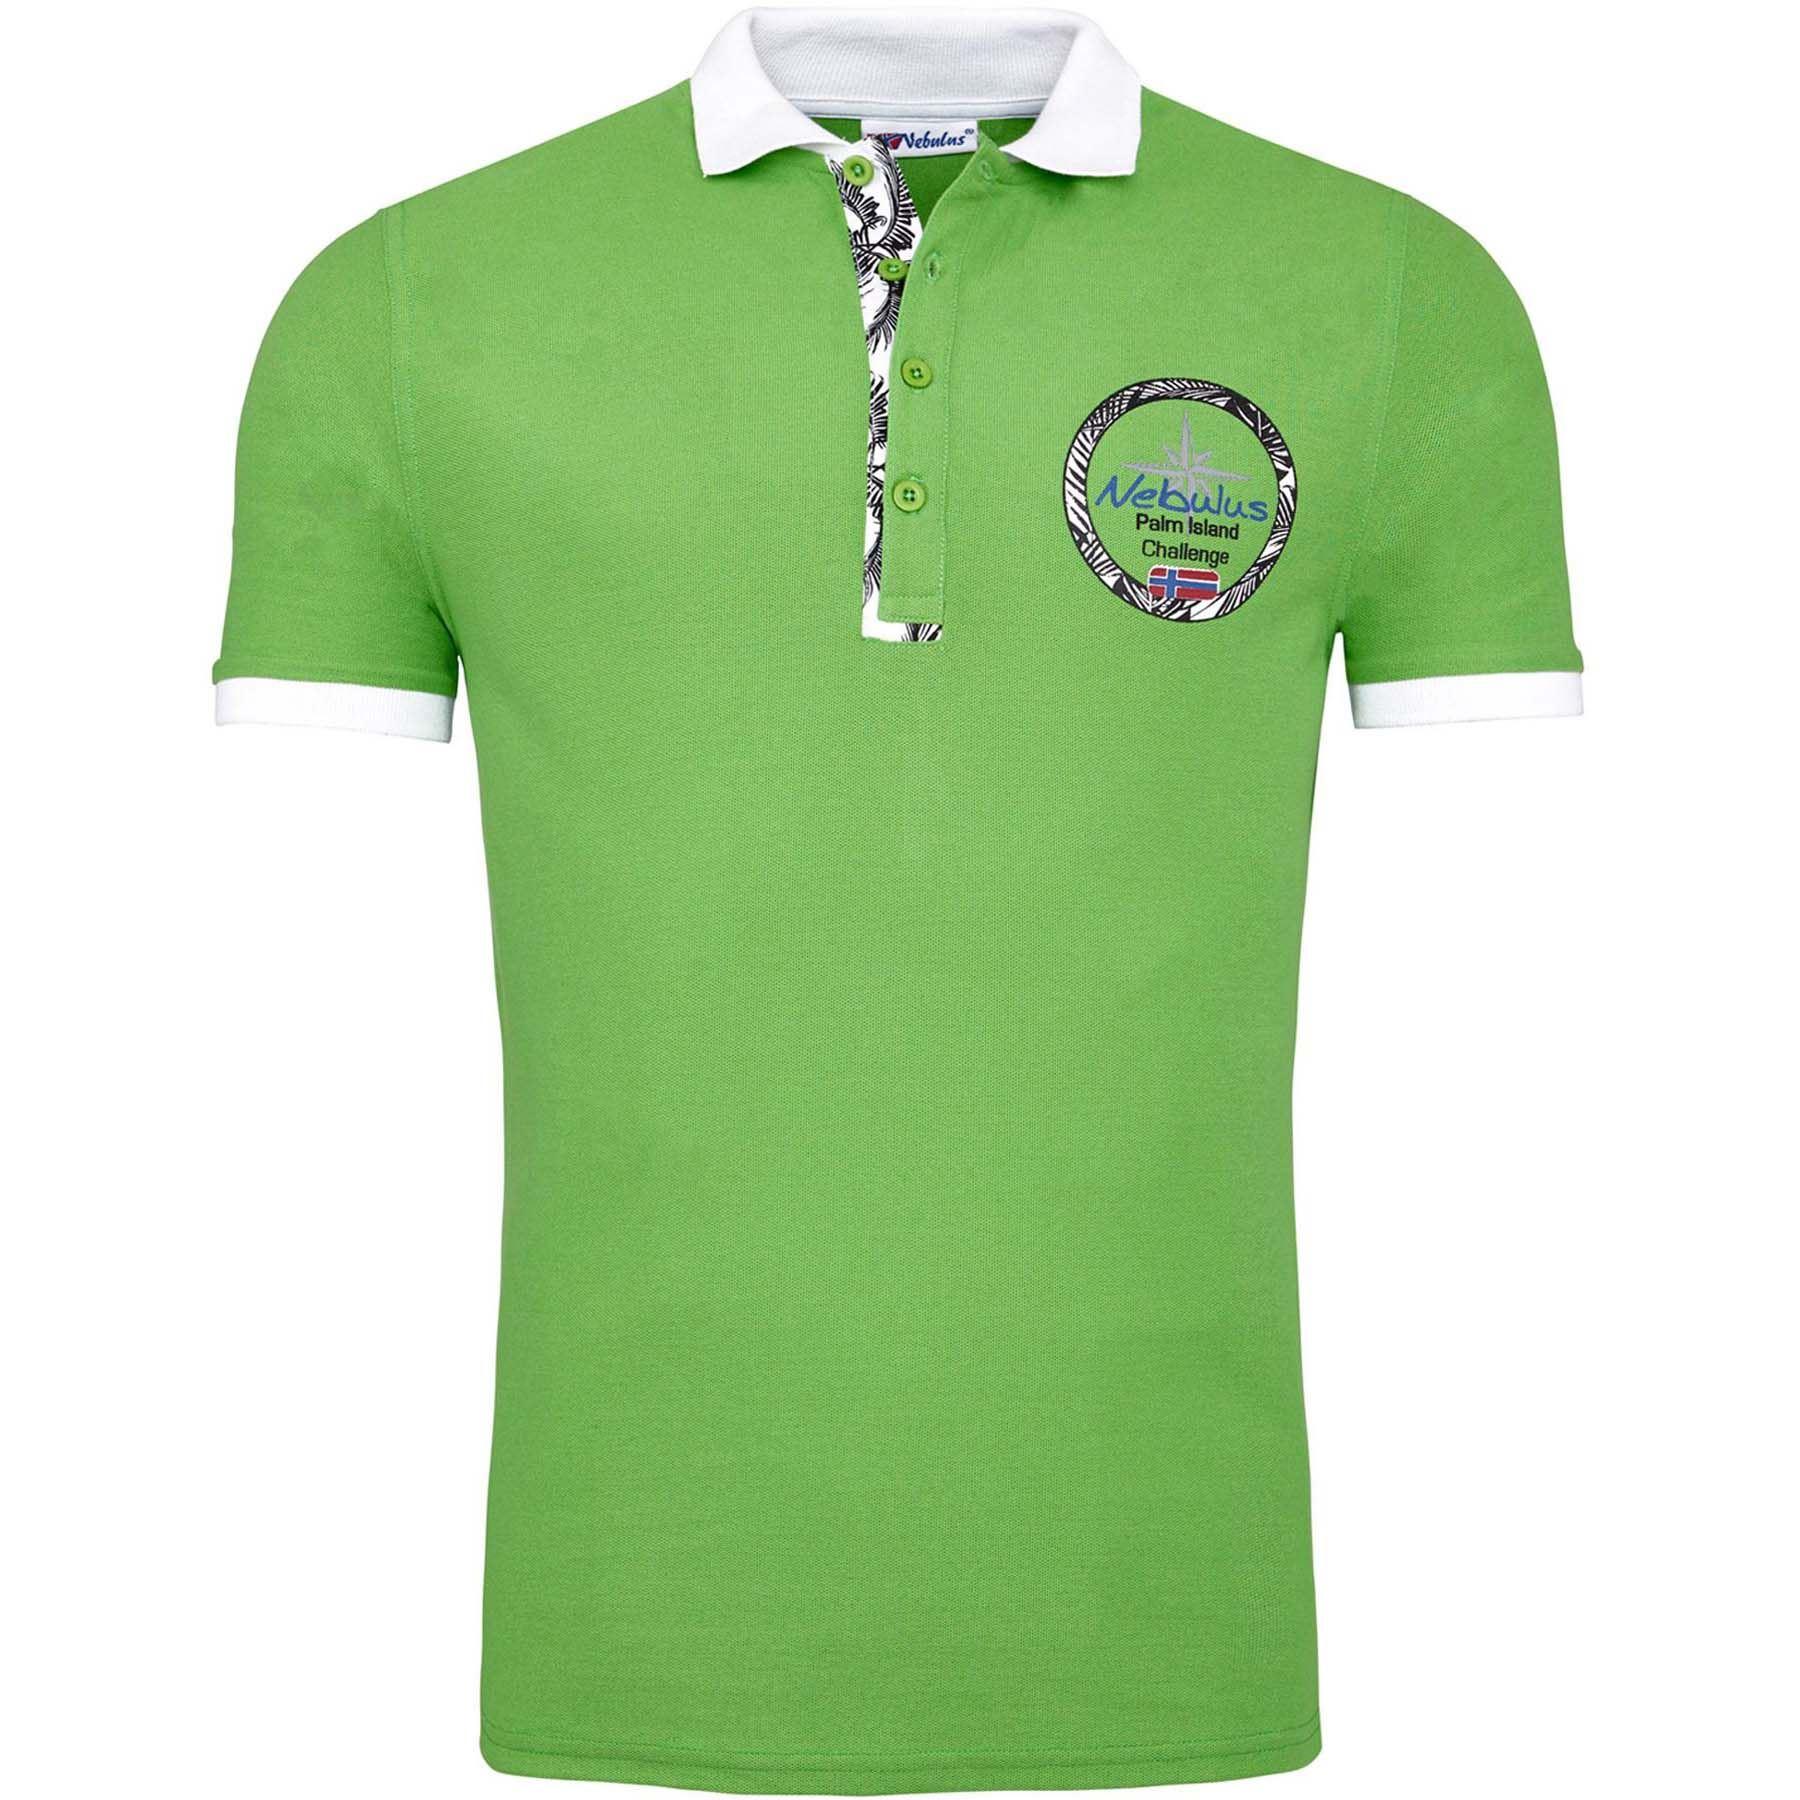 8154ba7b3be8d9 Polo-Shirt VITO Herren grün XL. P1167 01.jpg